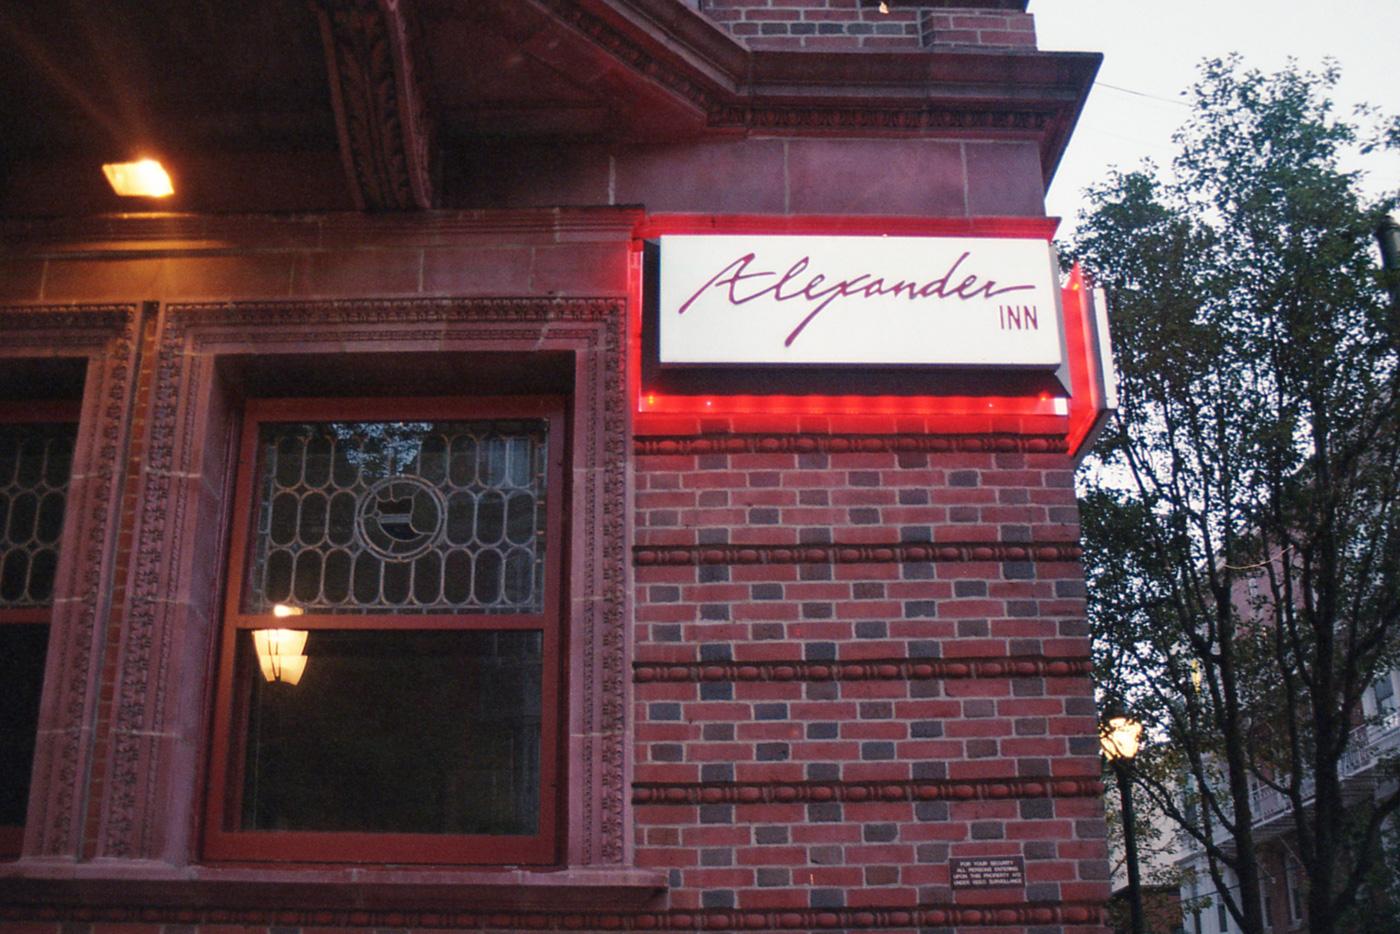 Alexander Inn